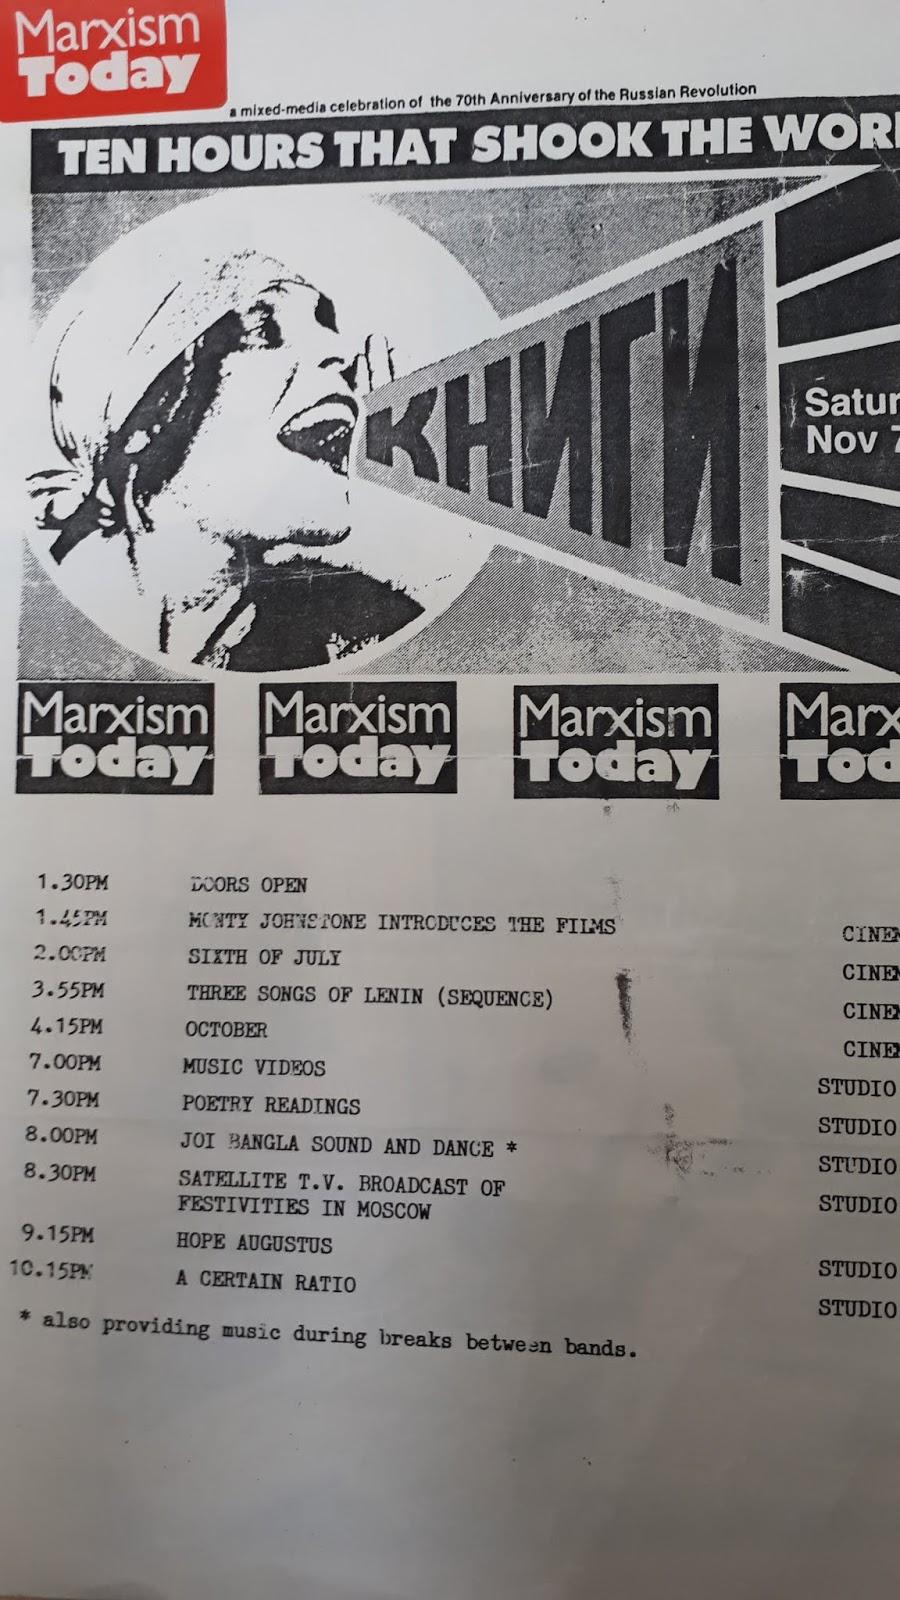 Riverside Studios, Hammersmith, London, 7 November 1987 - ACR Gigography